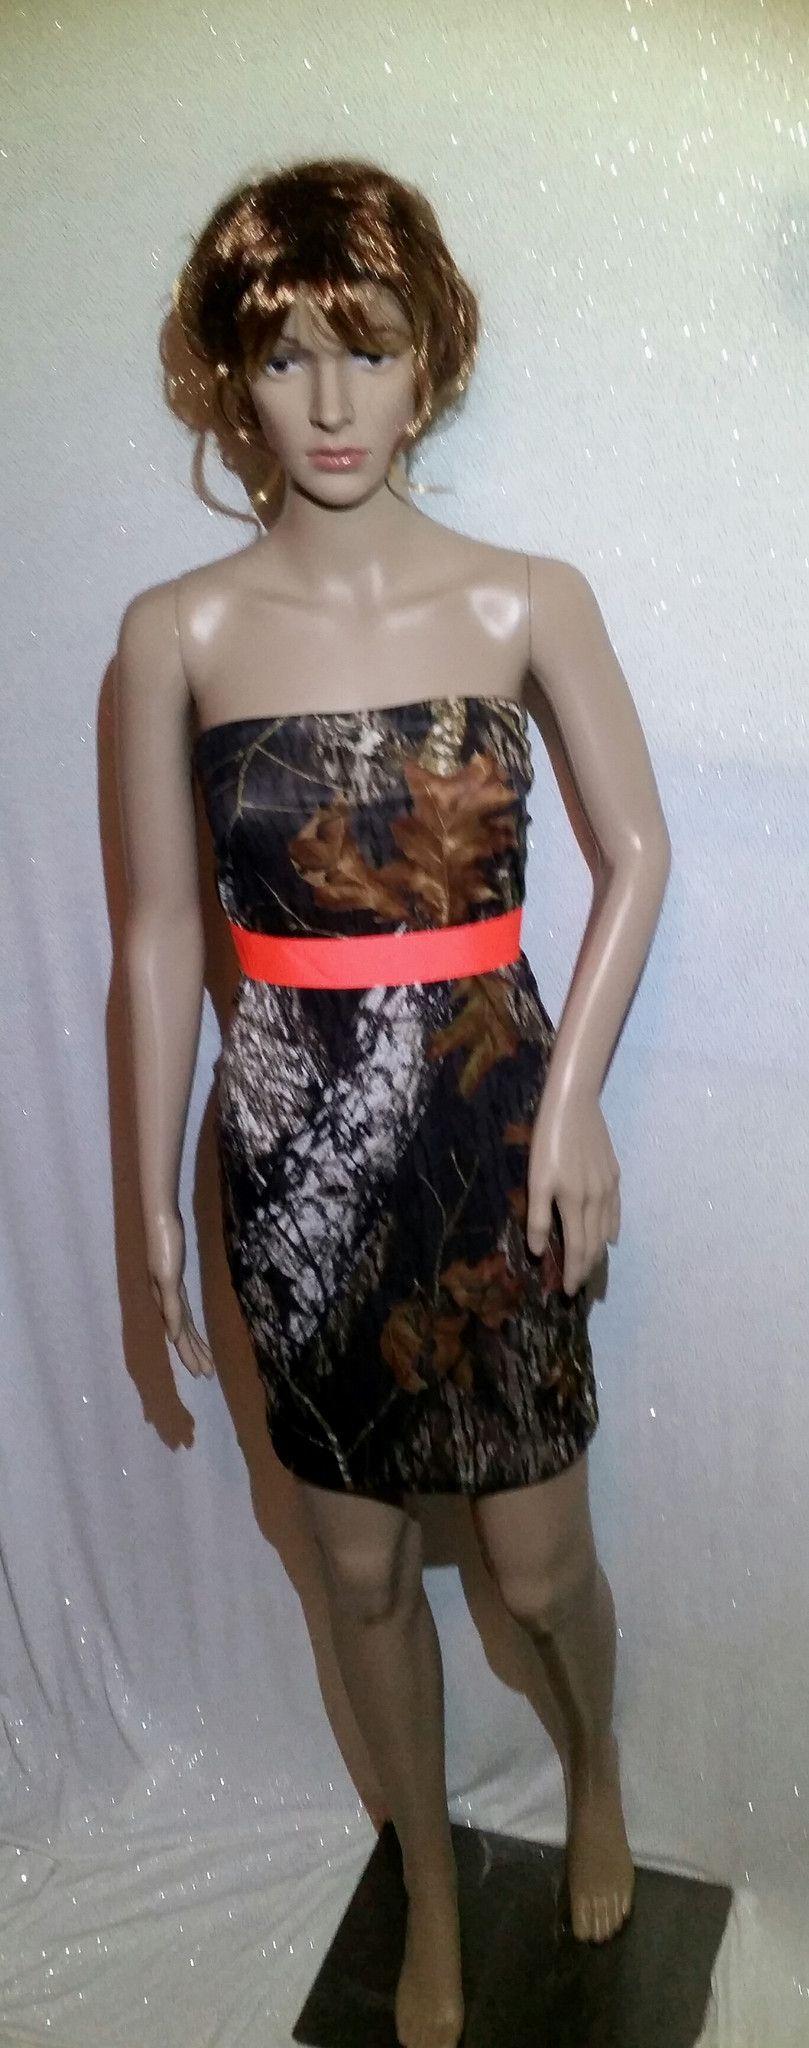 Camo and orange wedding dresses  Handmade Camouflage Strapless Dress with Hunter Orange Sash